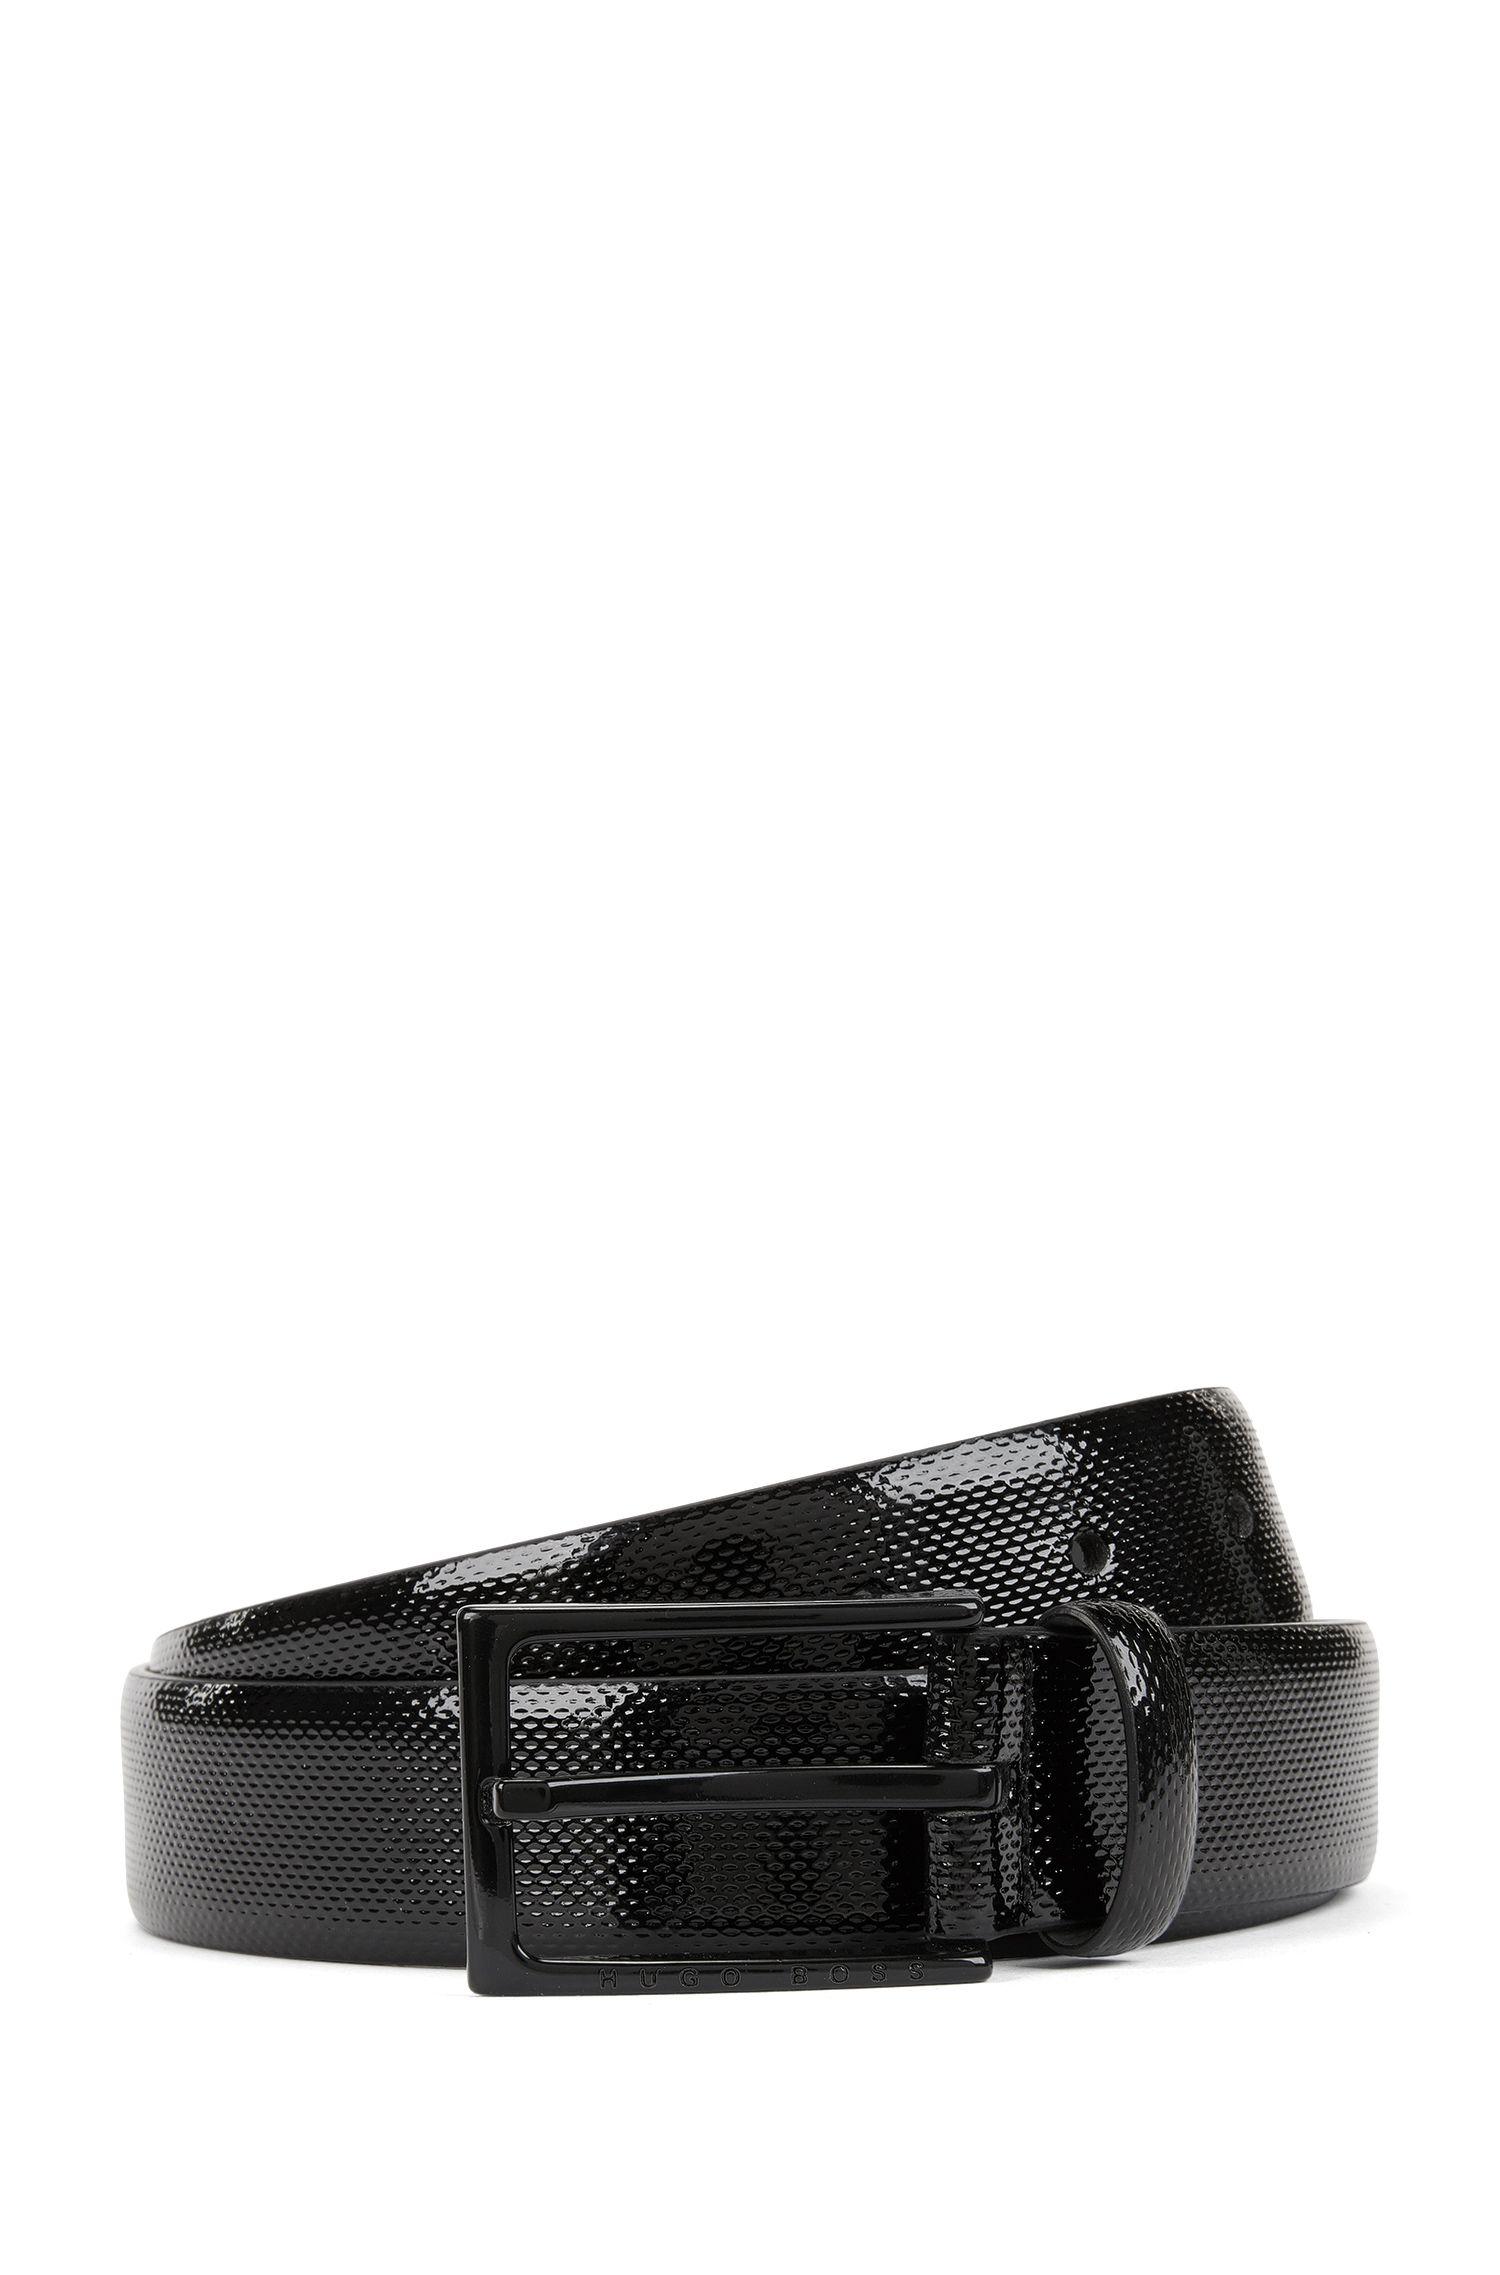 Embossed Patent Leather Belt | Cedry